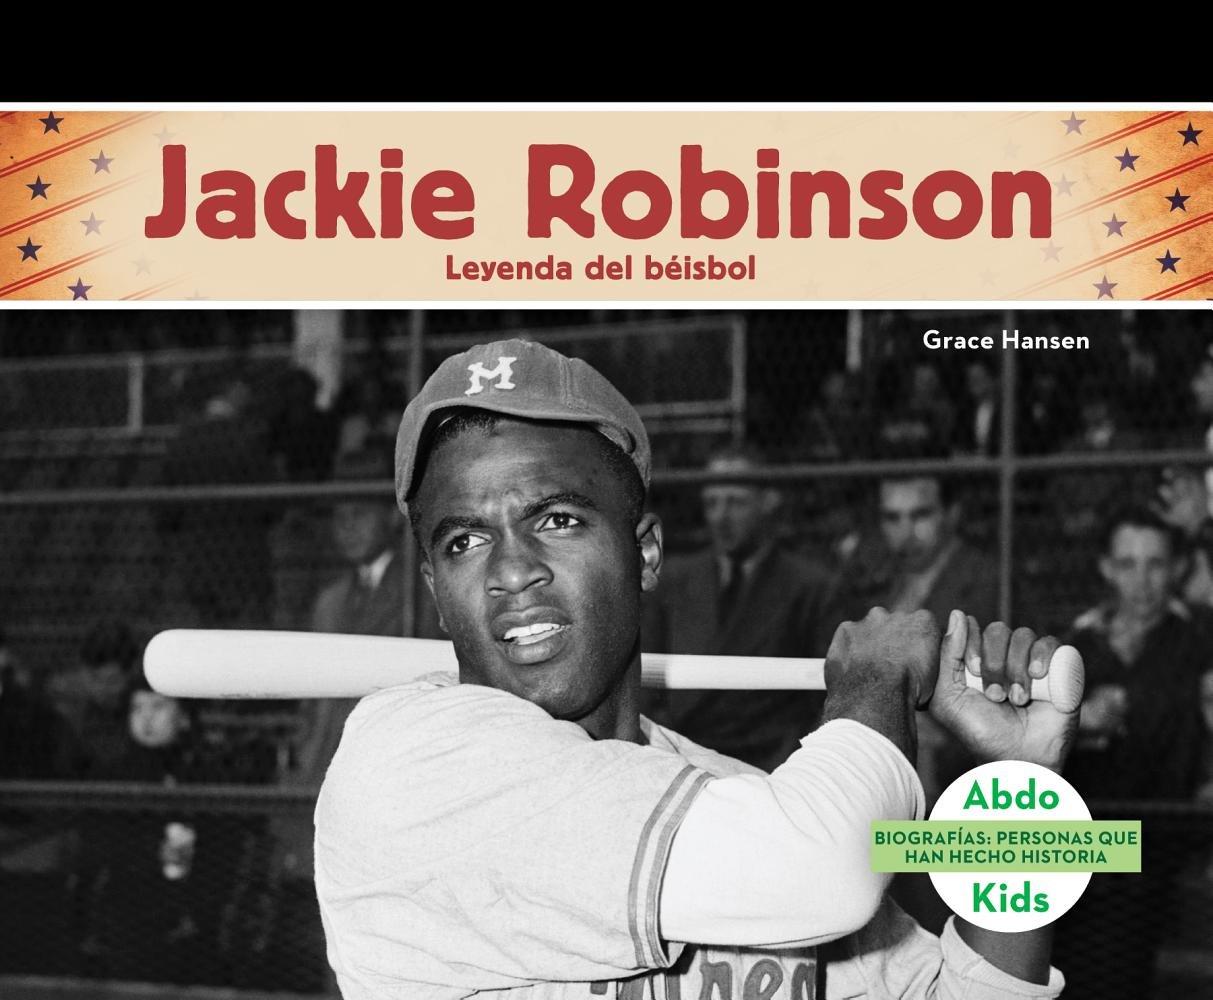 Jackie Robinson: Leyenda del beisbol/Baseball Legend (Biografias: Personas Que Han Hecho Historia/History Maker Biographies) (Spanish Edition)